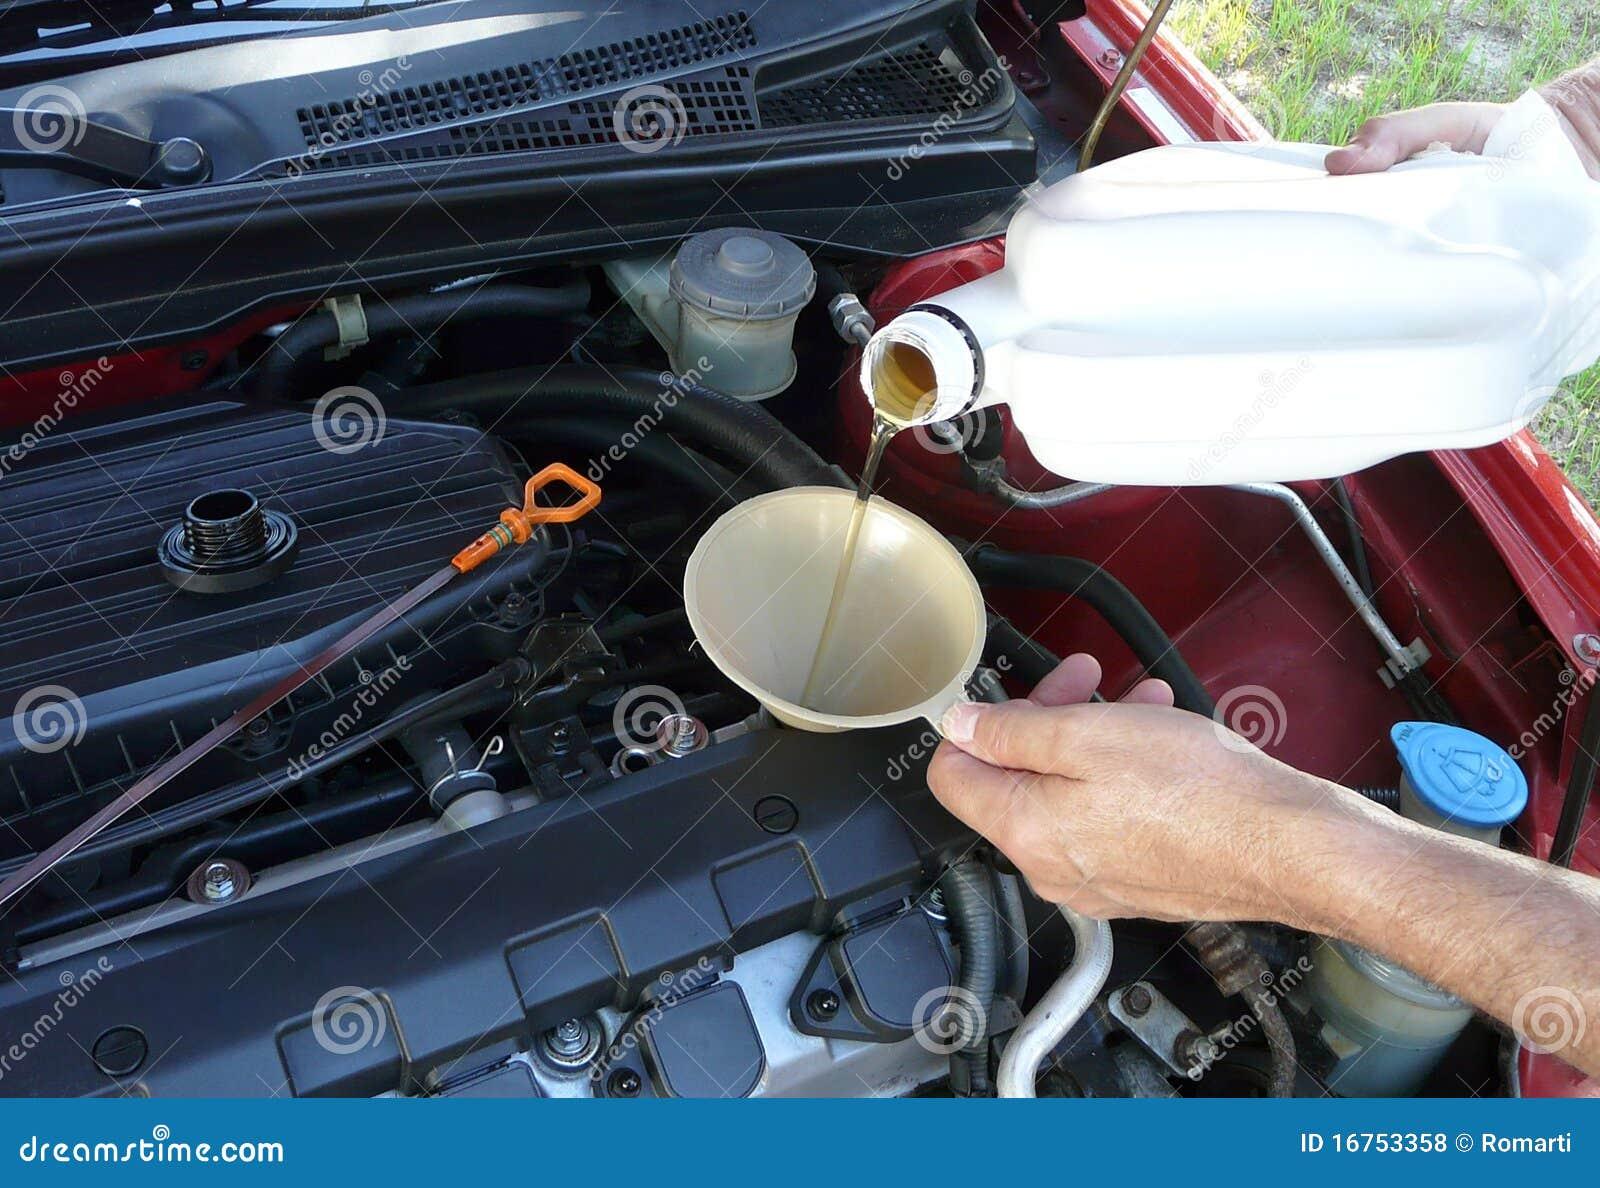 Adicionando o petróleo de motor ao carro